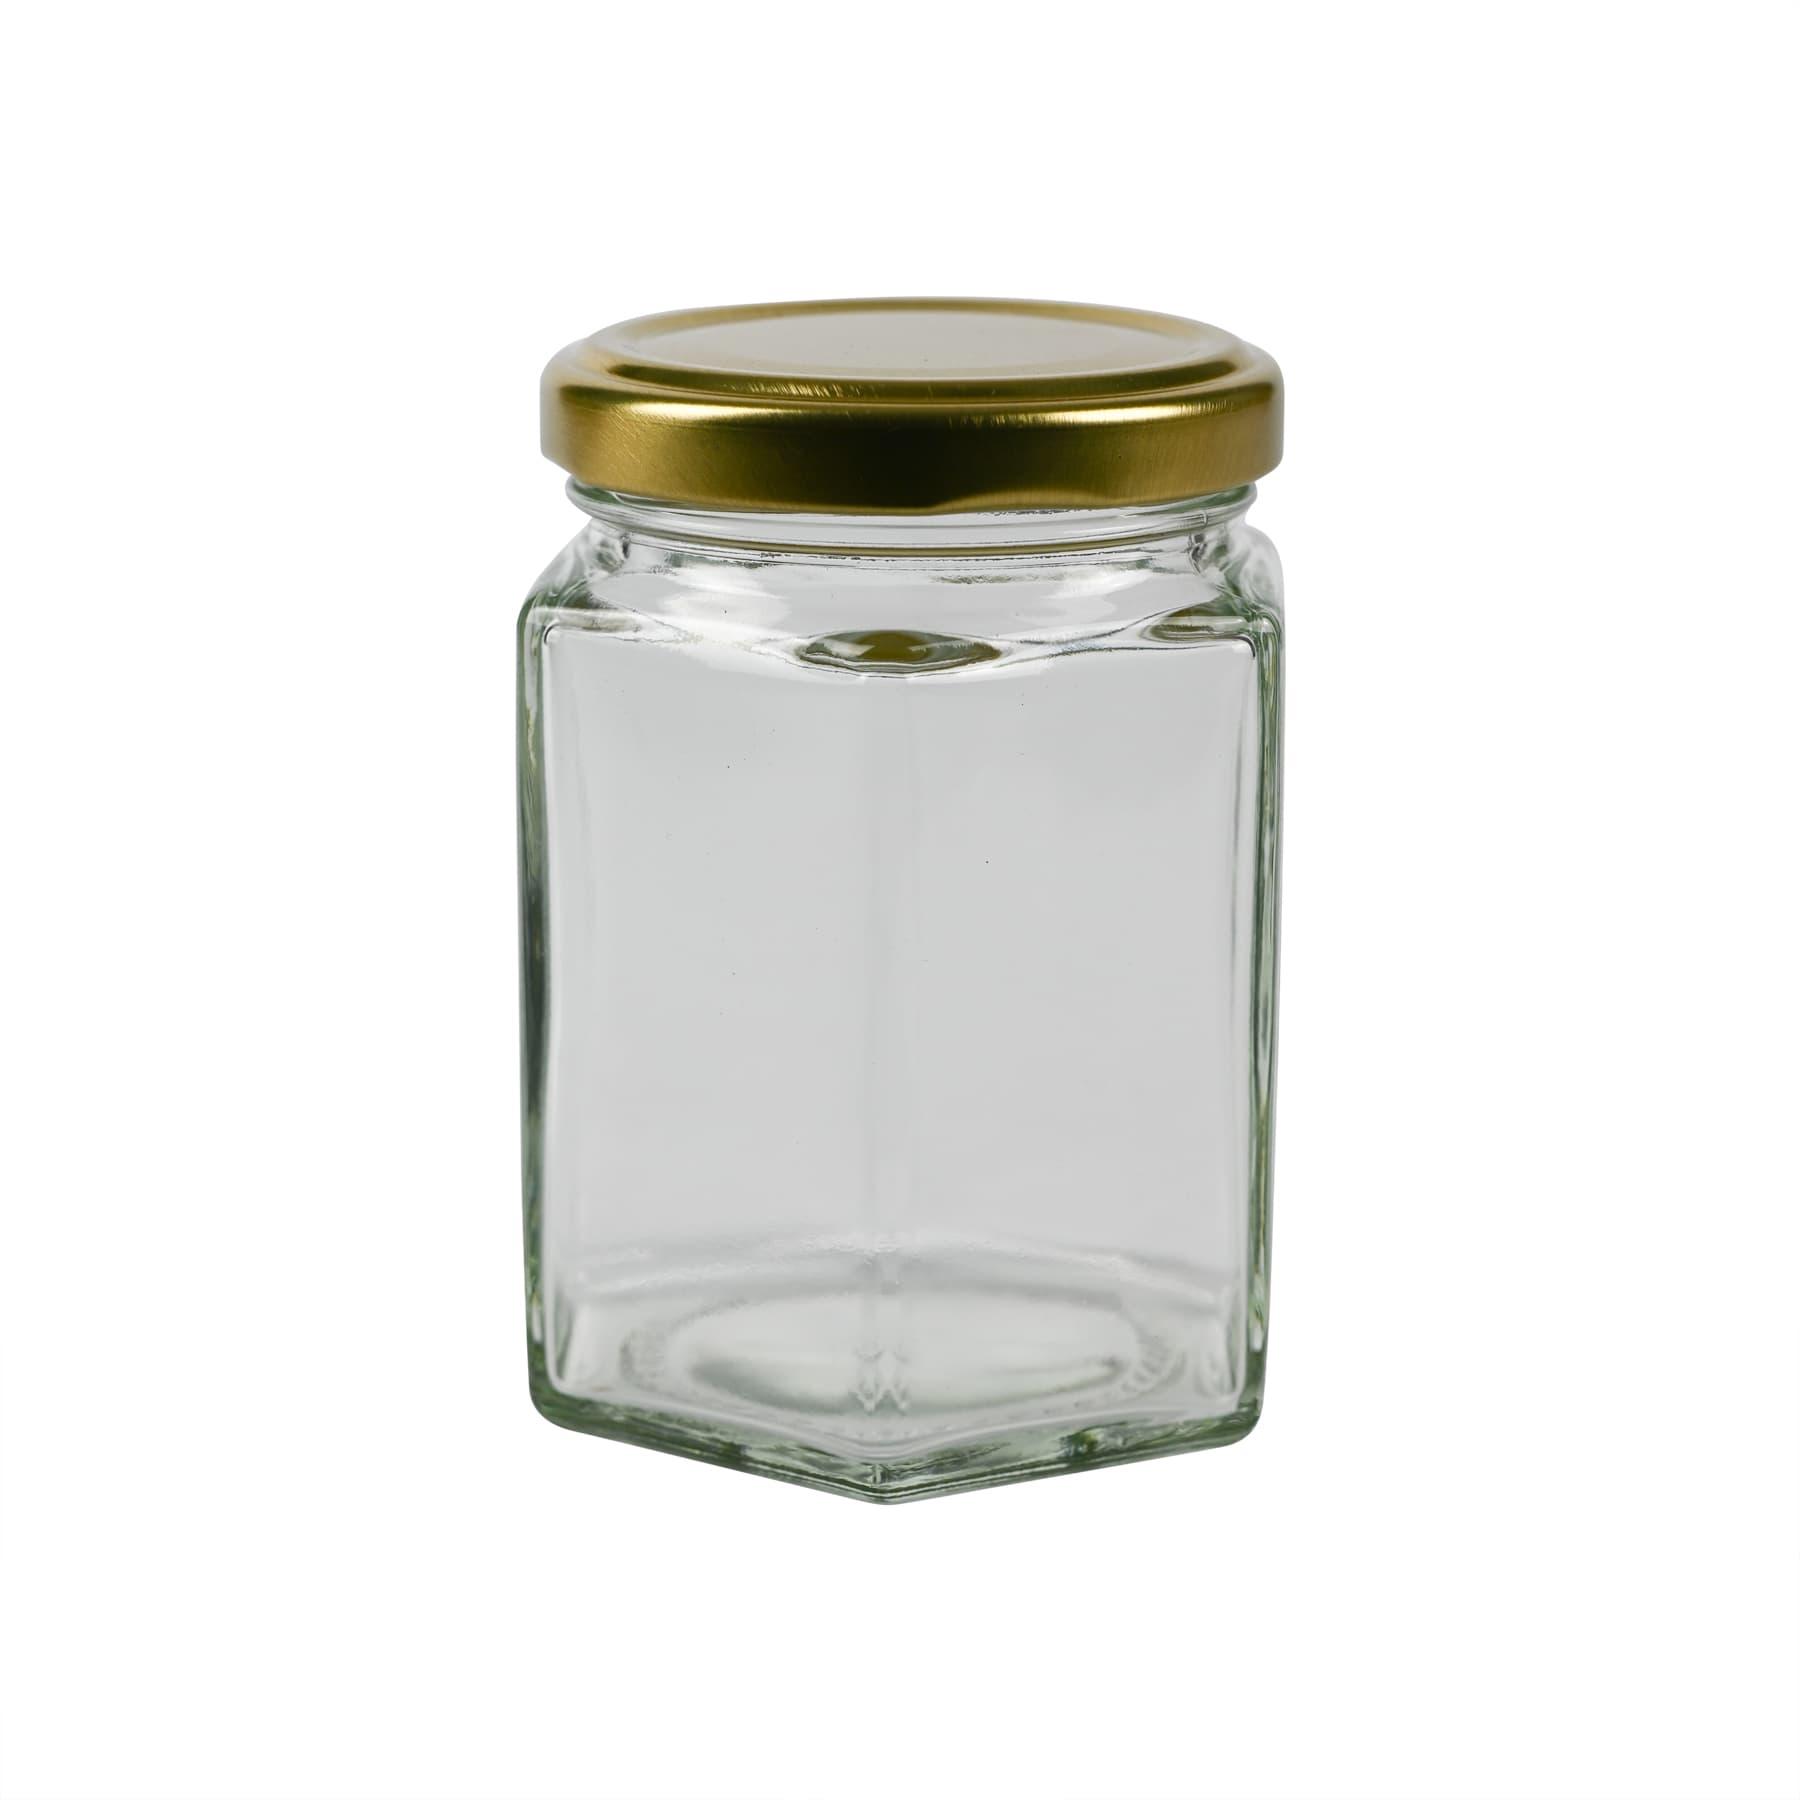 Sechseckglas 250 g (191 ml) 1 PAL(3367 Stk.) inkl. TO Metalldeckel gold 58mm, lose, FREI HAUS